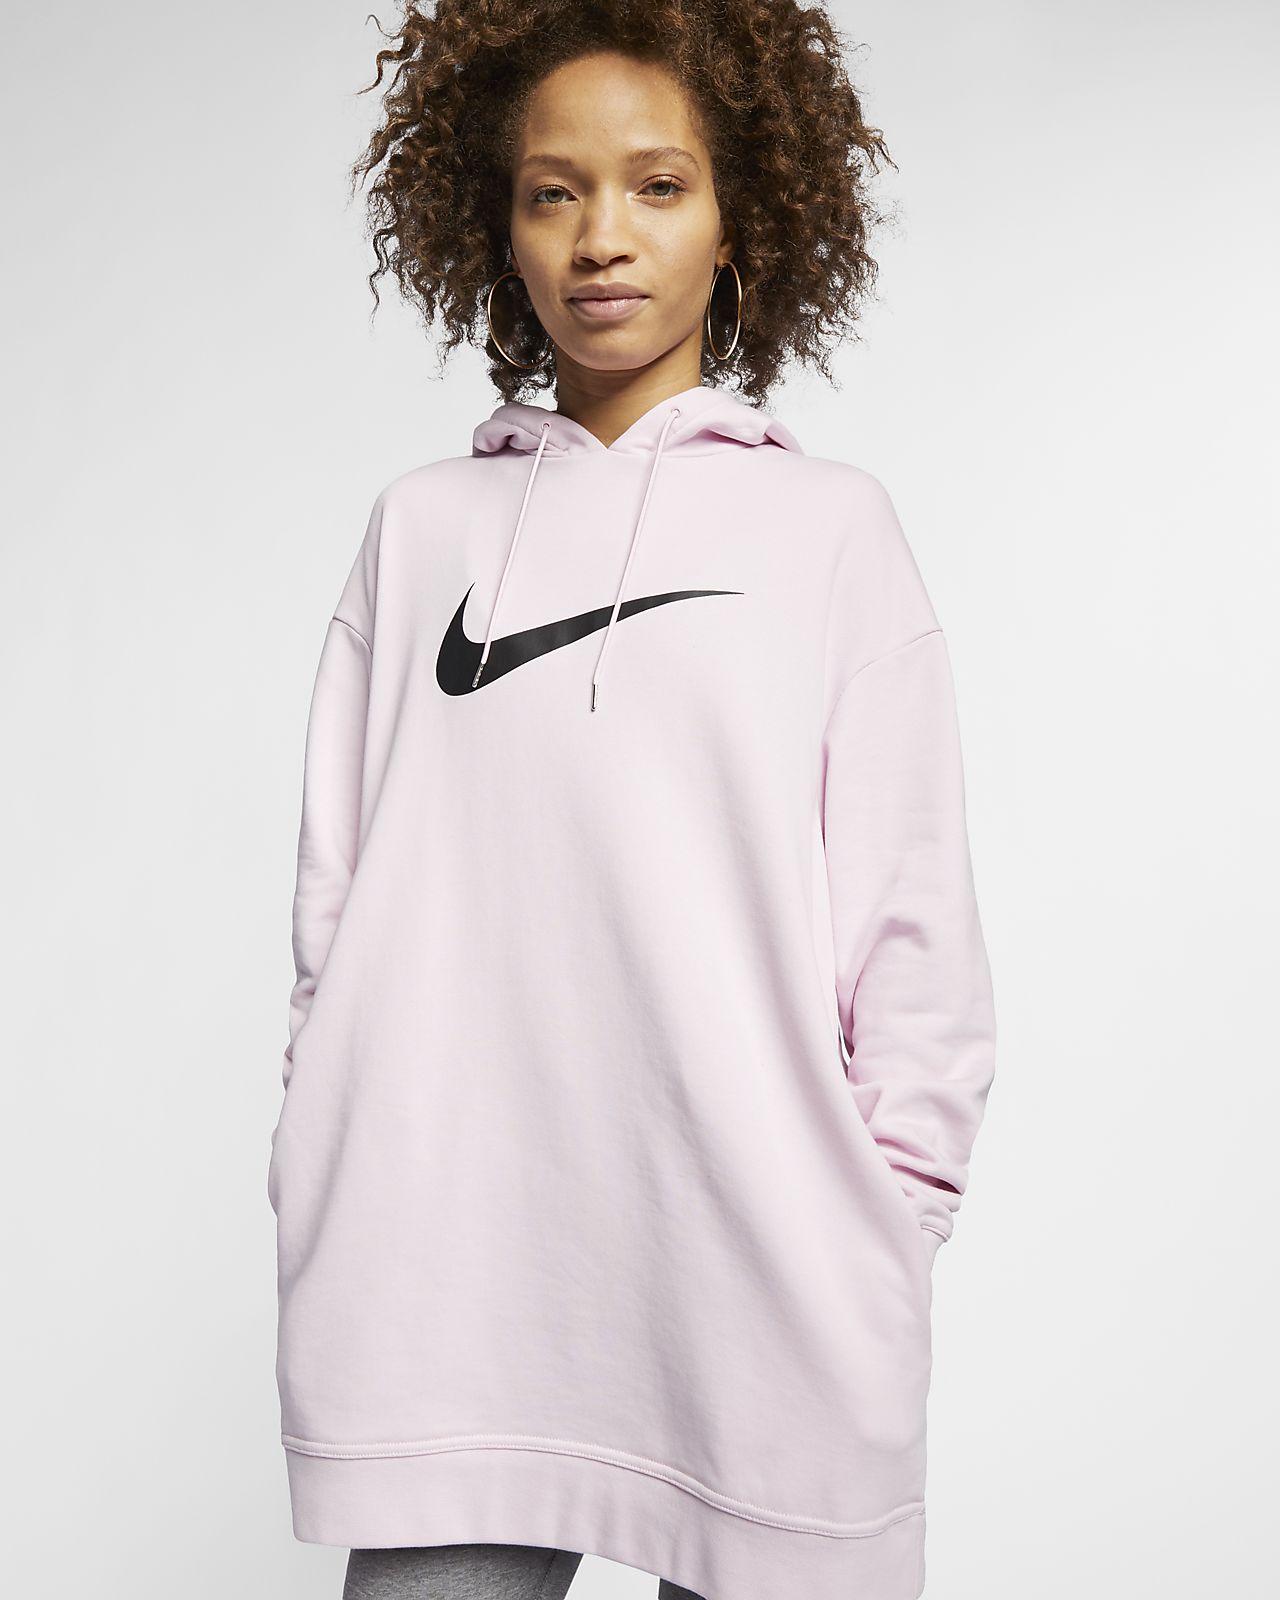 Swoosh Nike En Pour Sweat Femme À Sportswear Capuche Molleton qYIH4Rw